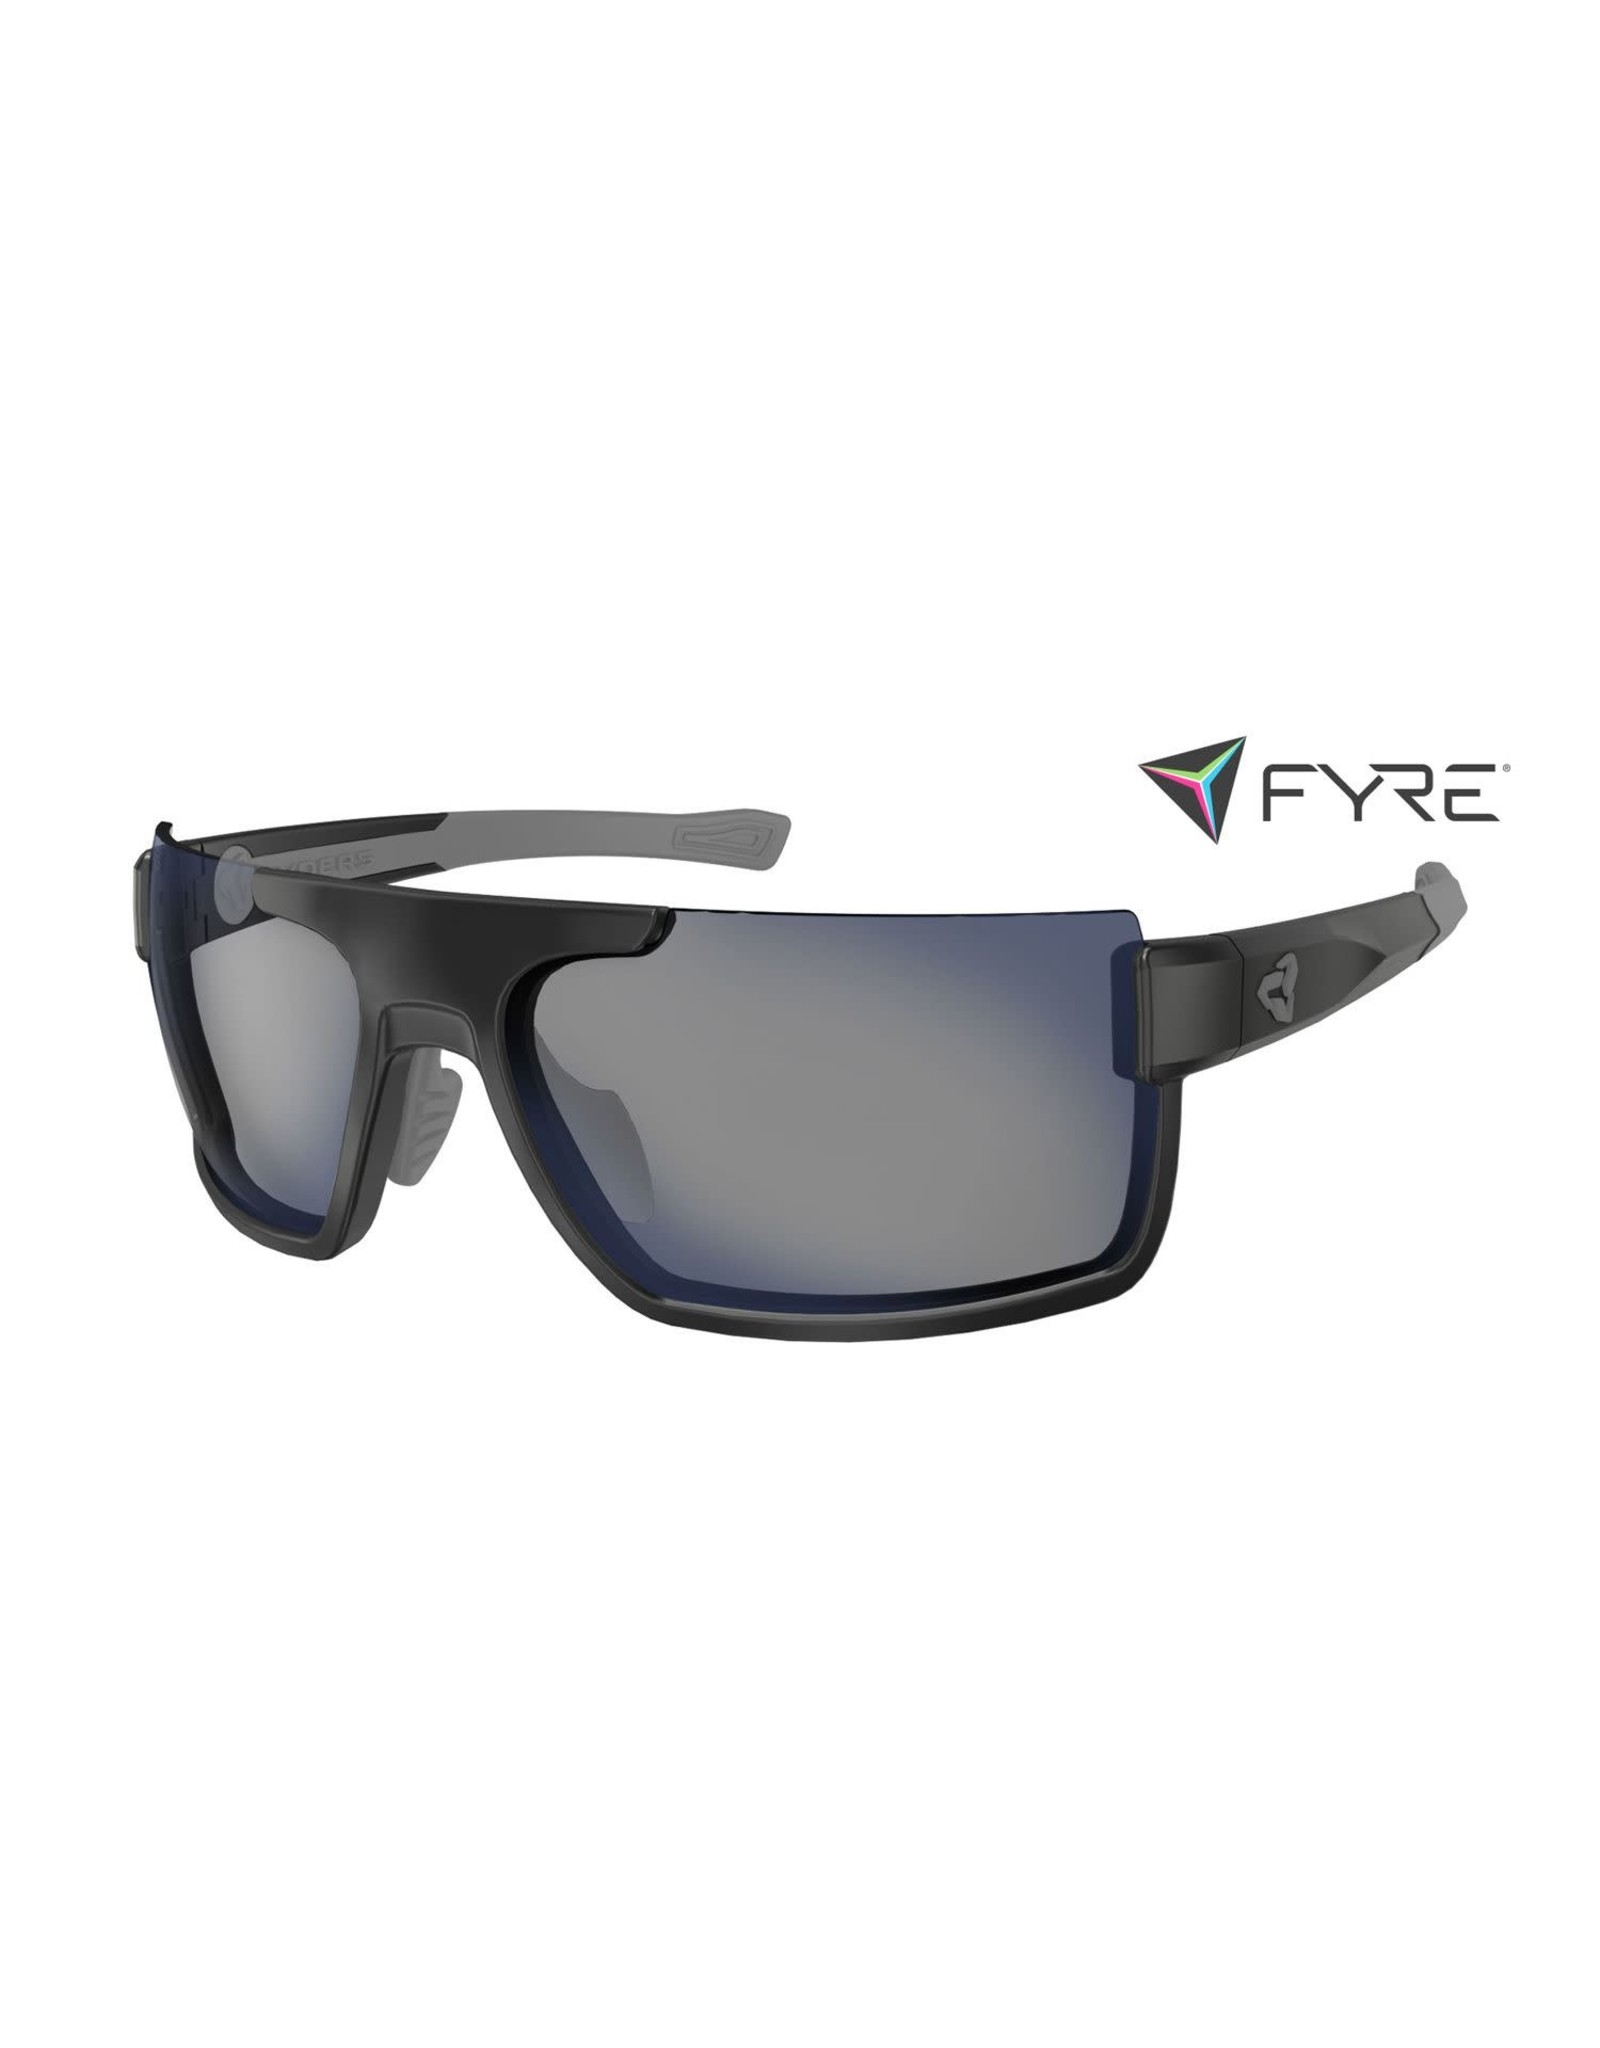 Ryders Incline Fyre Cycling Sunglassesw/anti-fogging